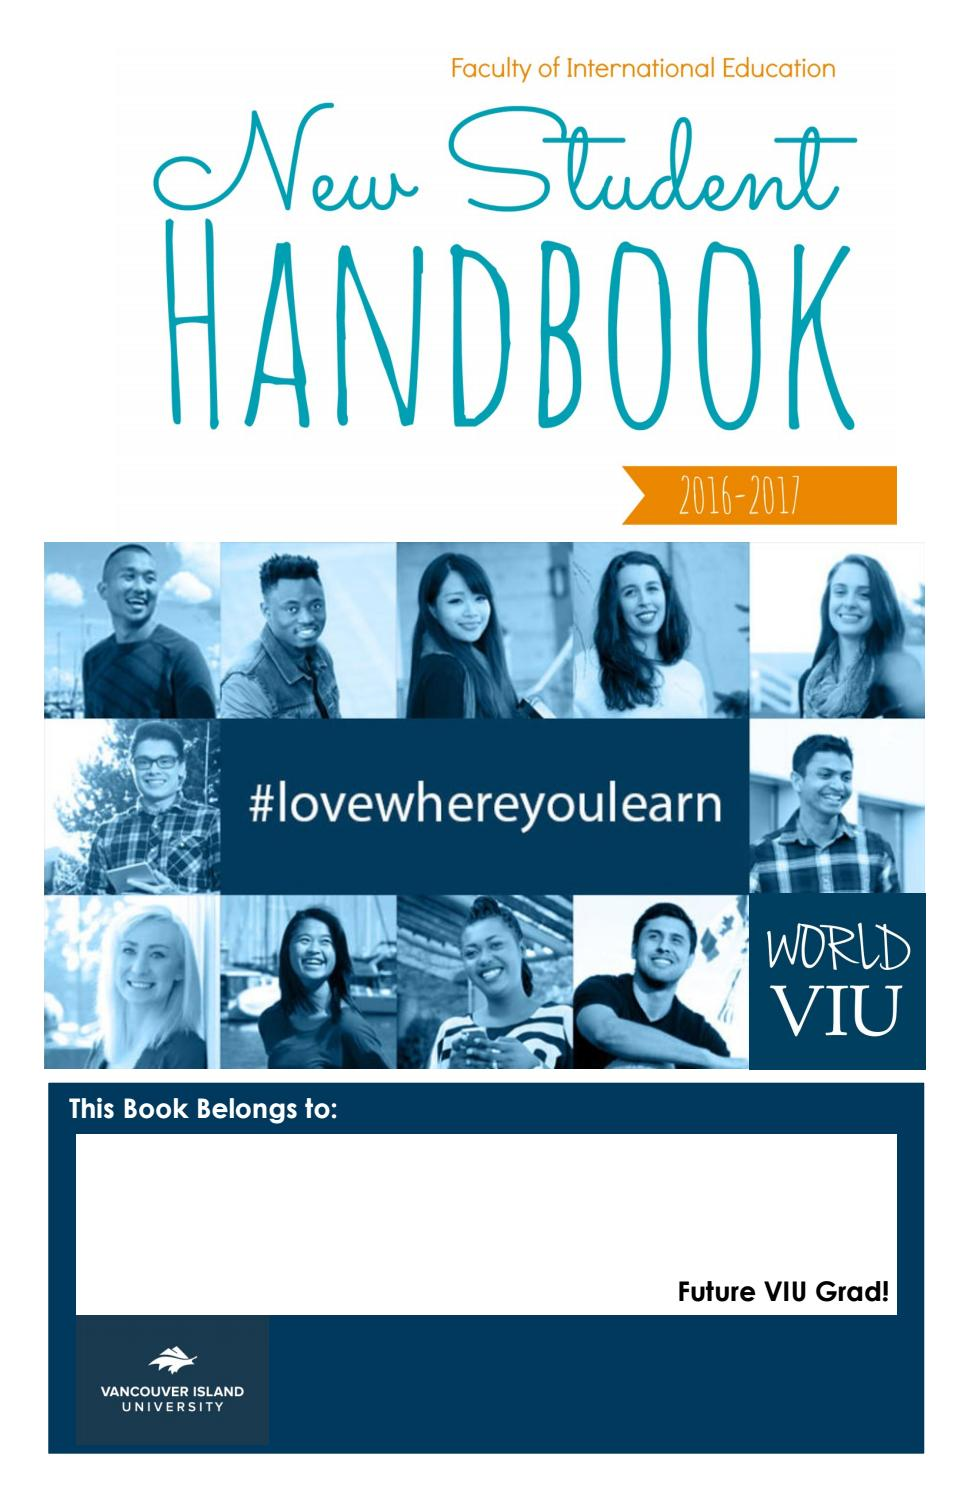 VIU International Student Handbook 2016-2017 by VIU Faculty